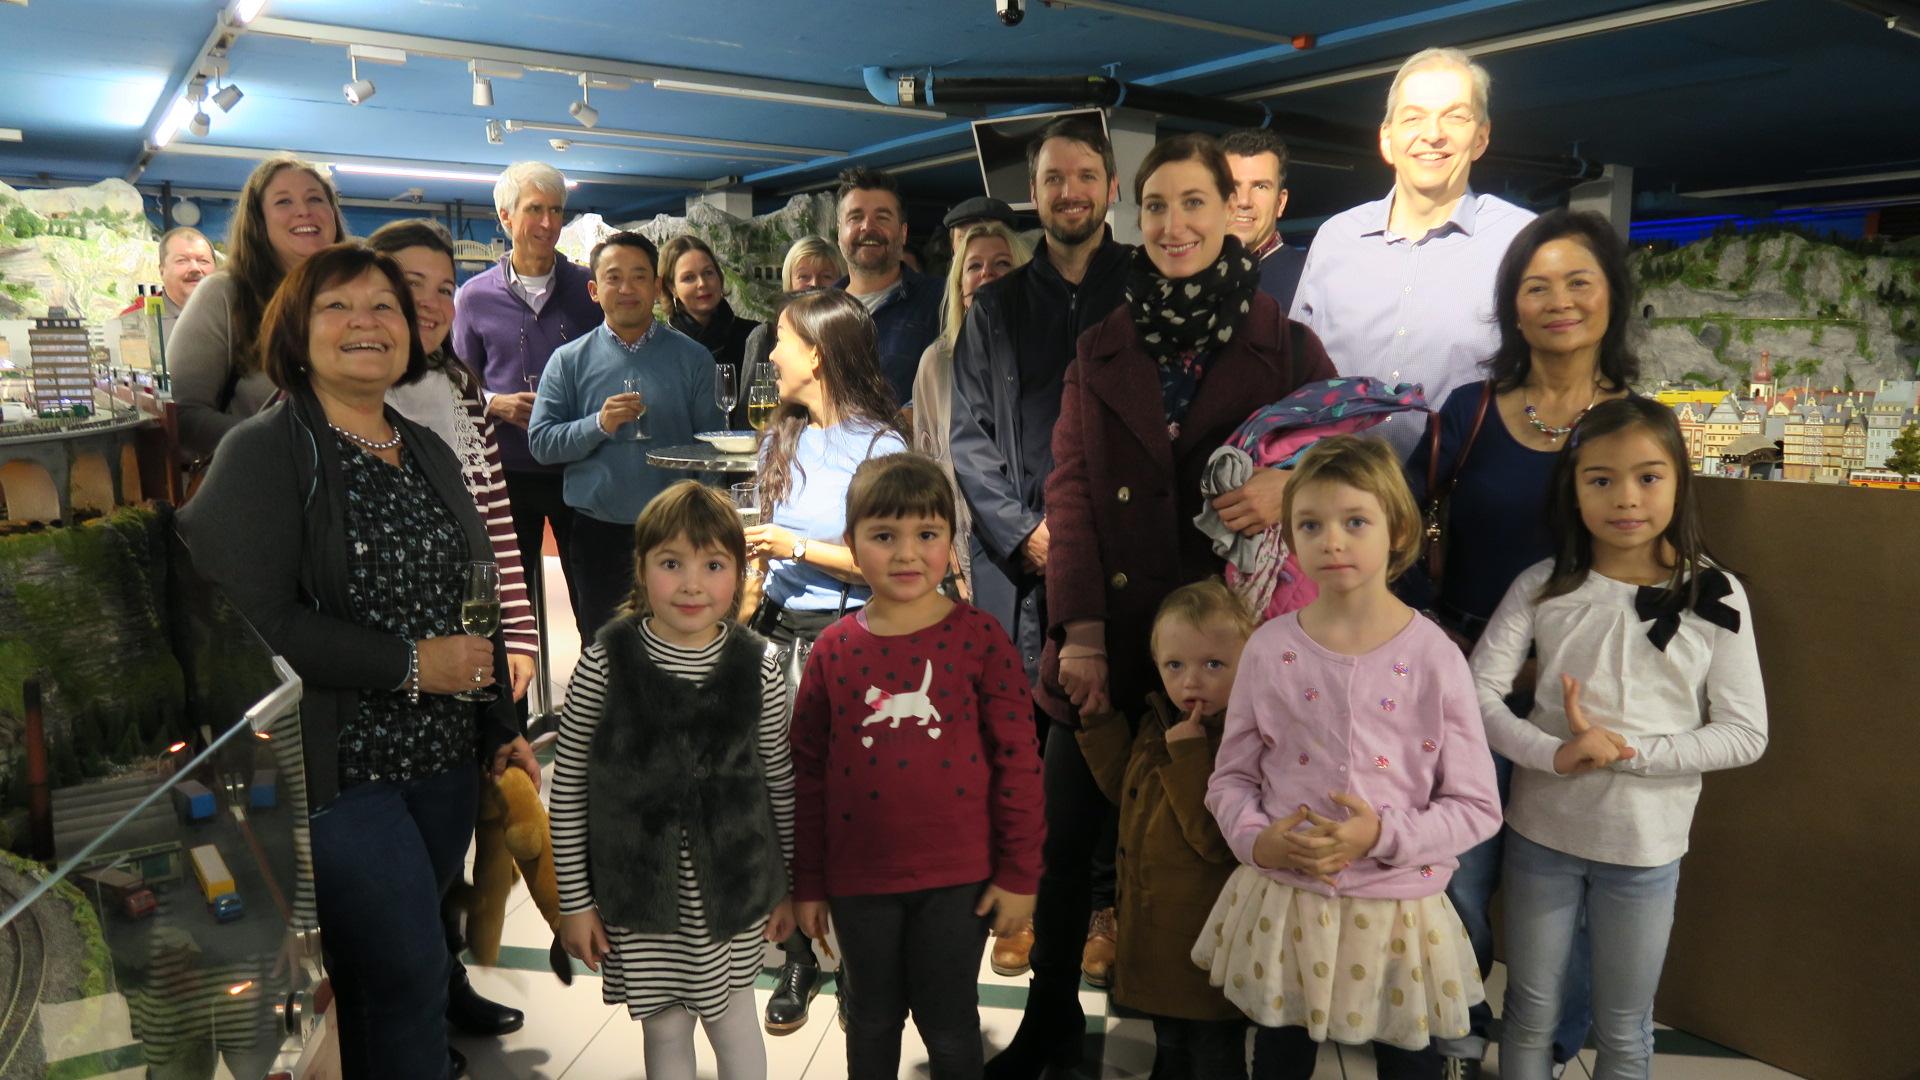 29.10.2016 - Familie Niggli Treffen, Org. Markus Niggli